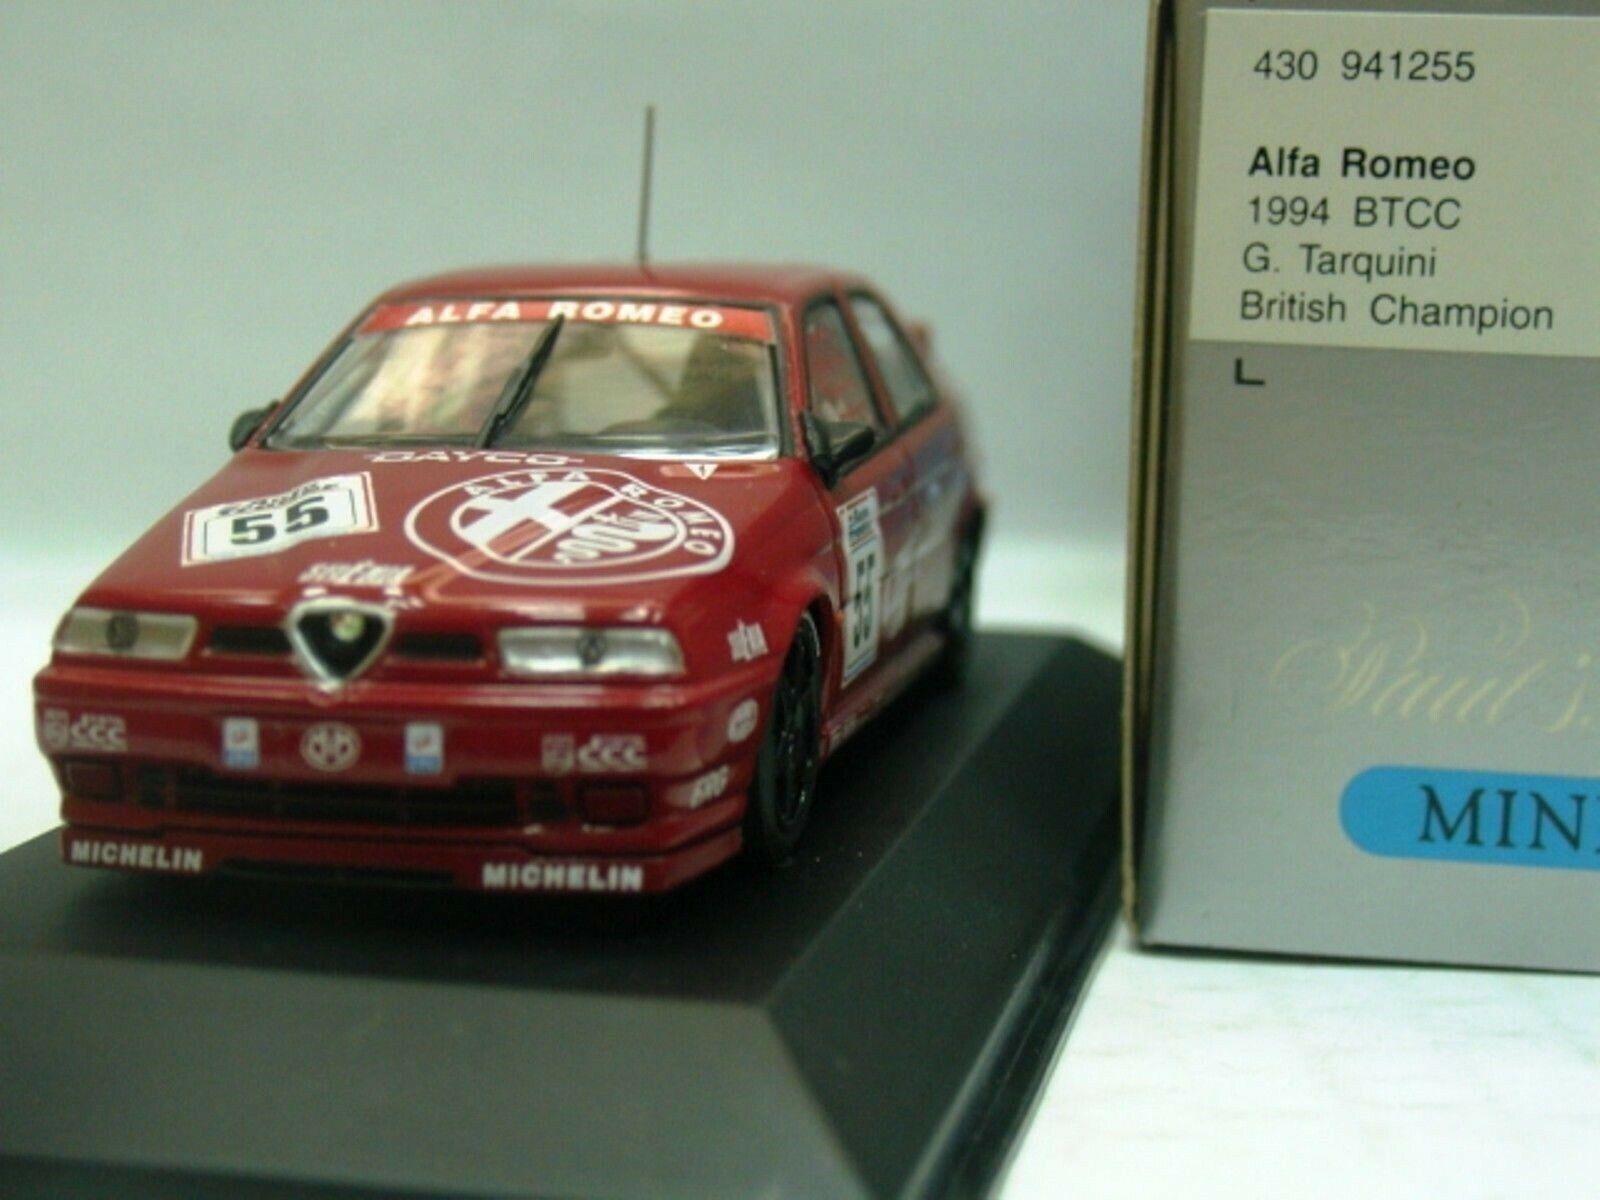 WOW EXTREMELY RARE Alfa Romeo 155 SV Tarquini Champion BTCC 1994 1 43 Minichamps